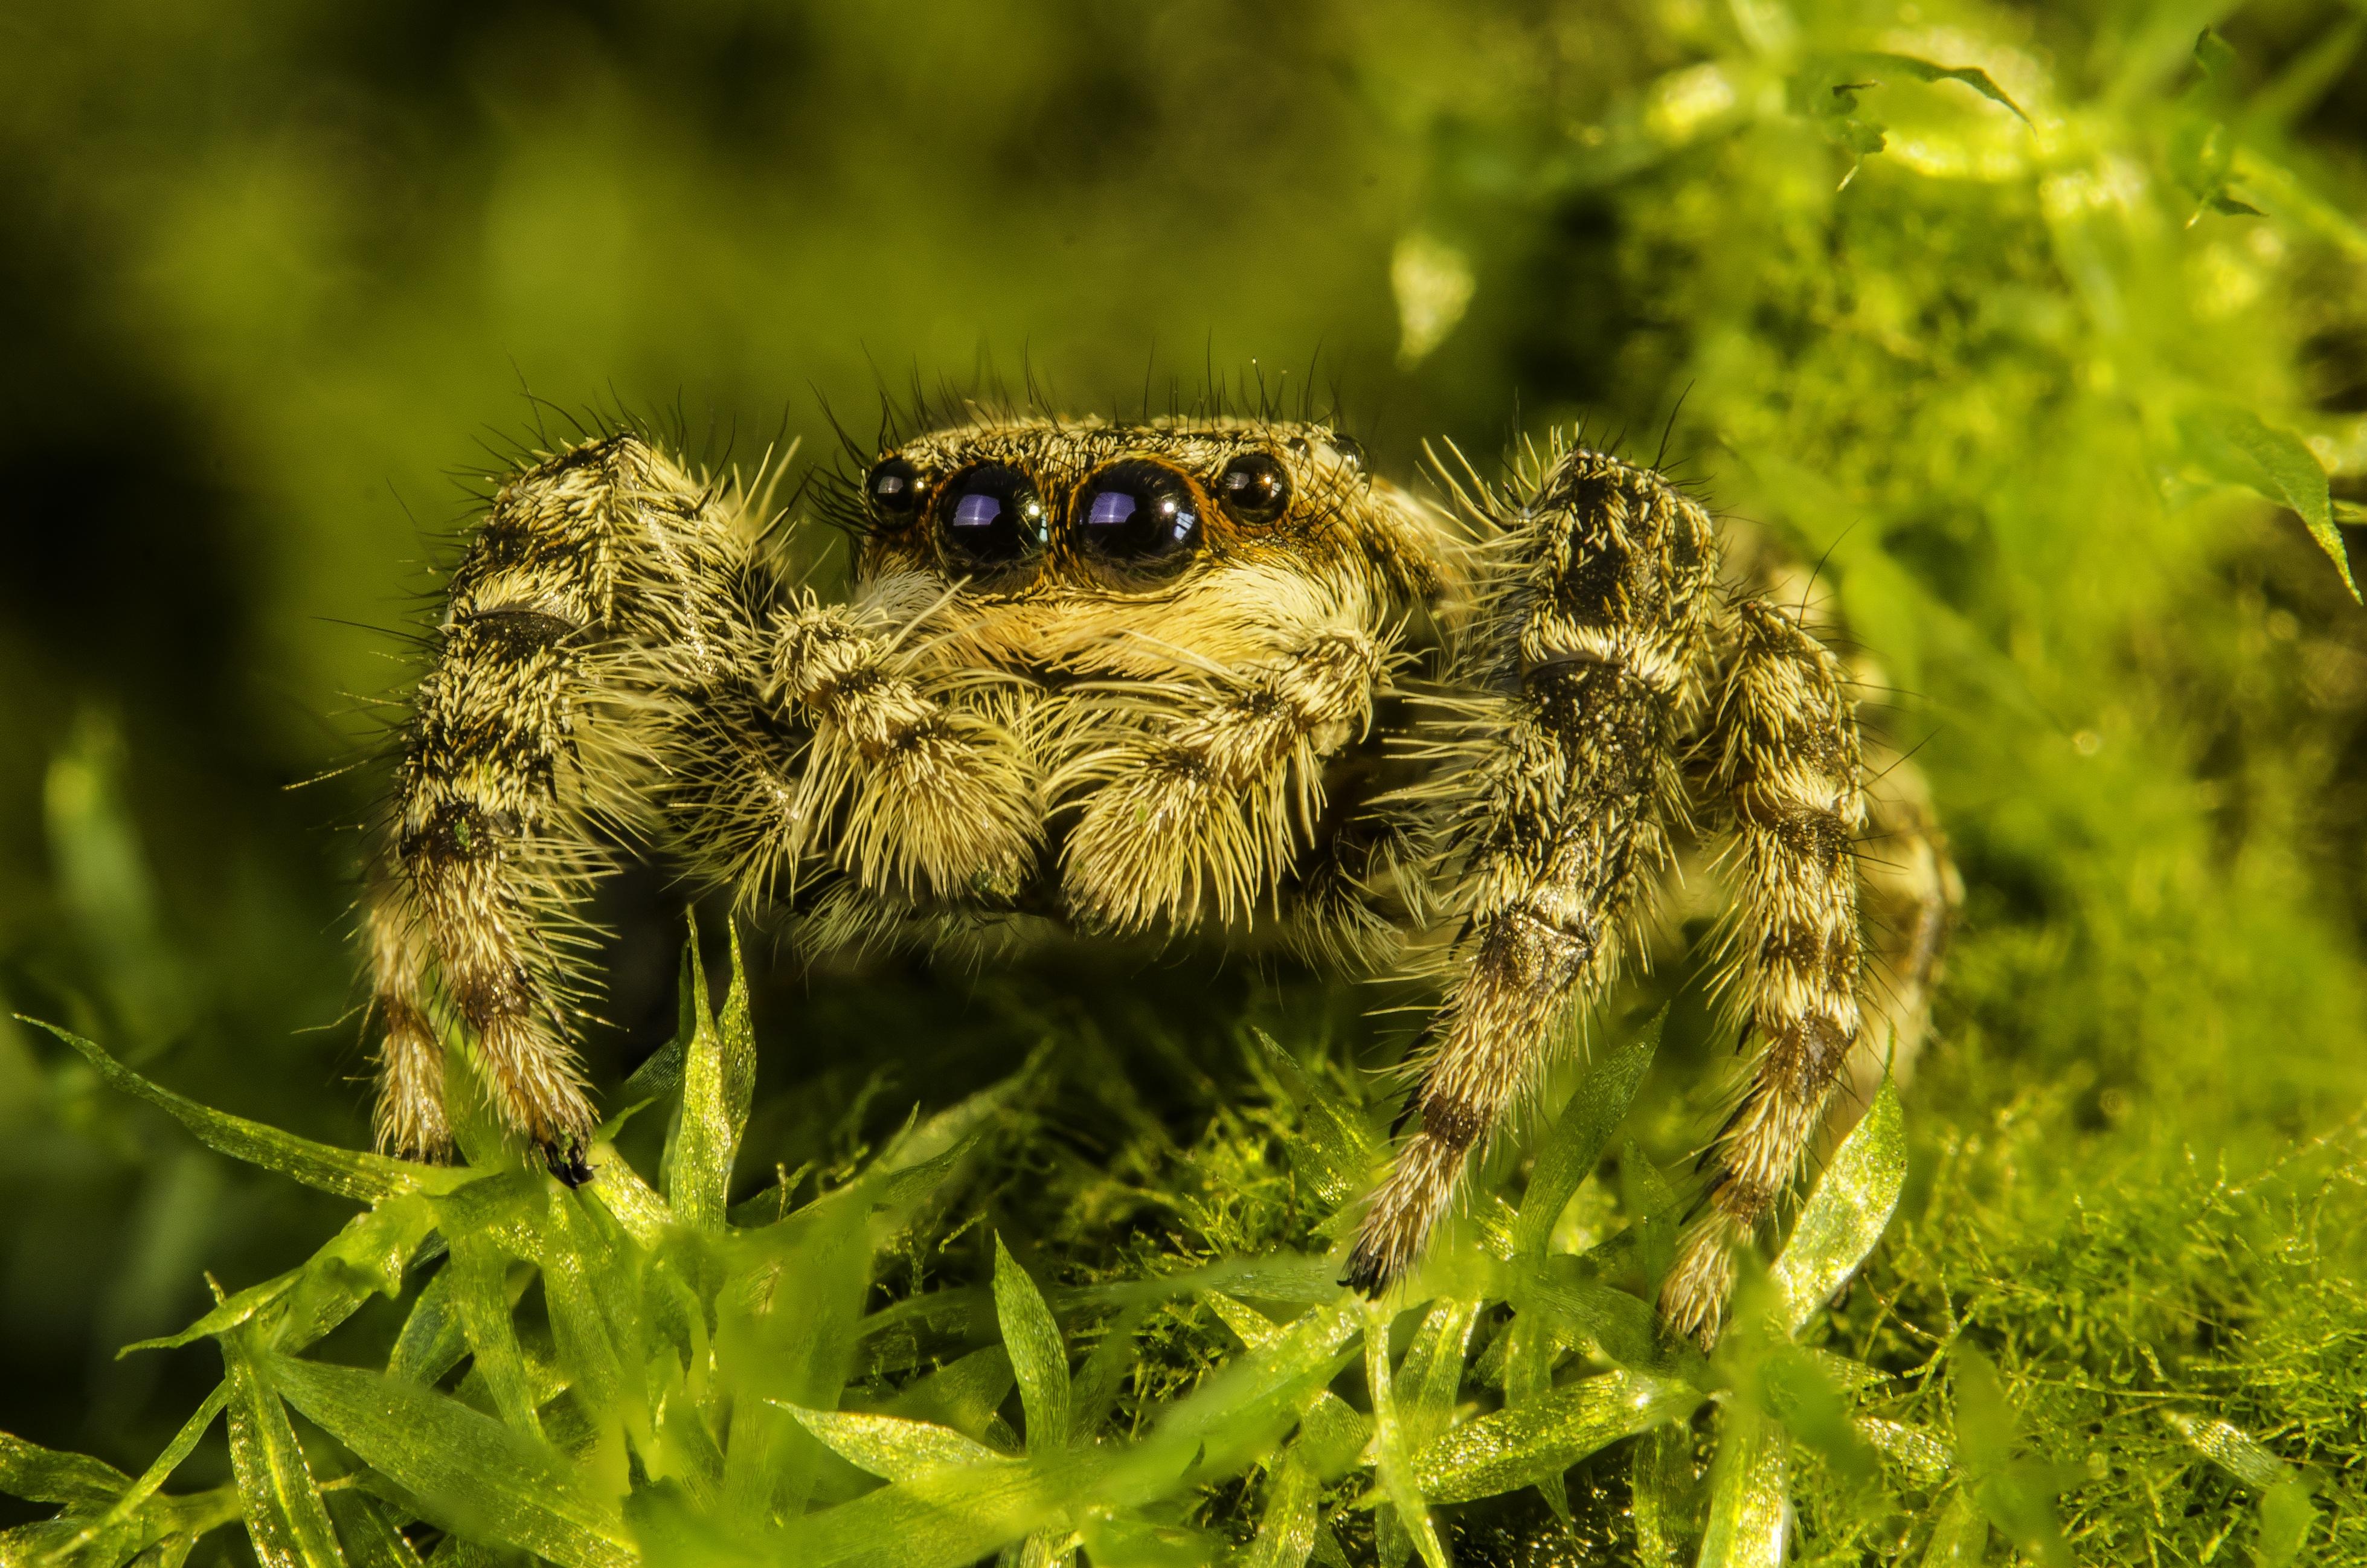 Love Cute Wallpaper Free Download Free Stock Photo Of Arachnid Close Up Macro